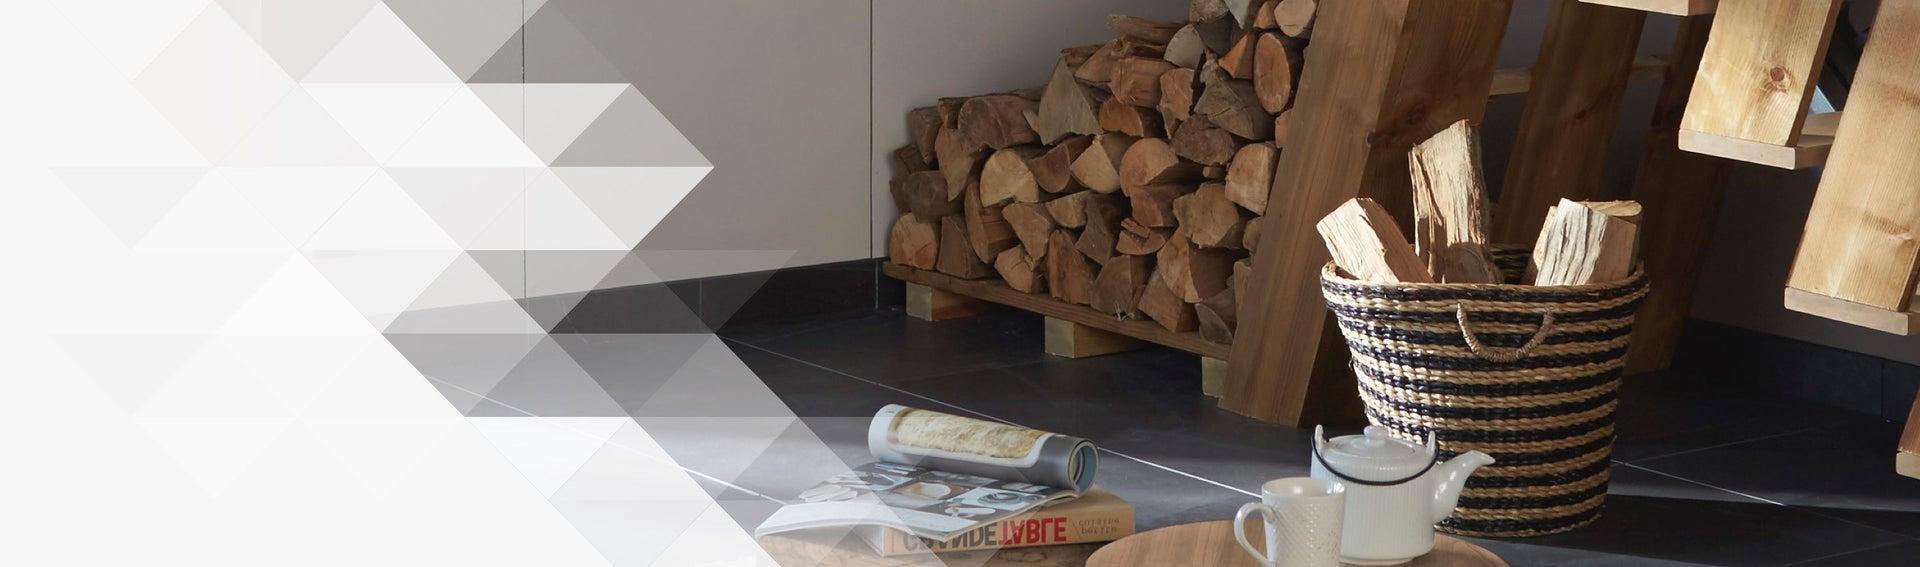 po le bois po le granul s chemin e et bois de chauffage leroy merlin. Black Bedroom Furniture Sets. Home Design Ideas